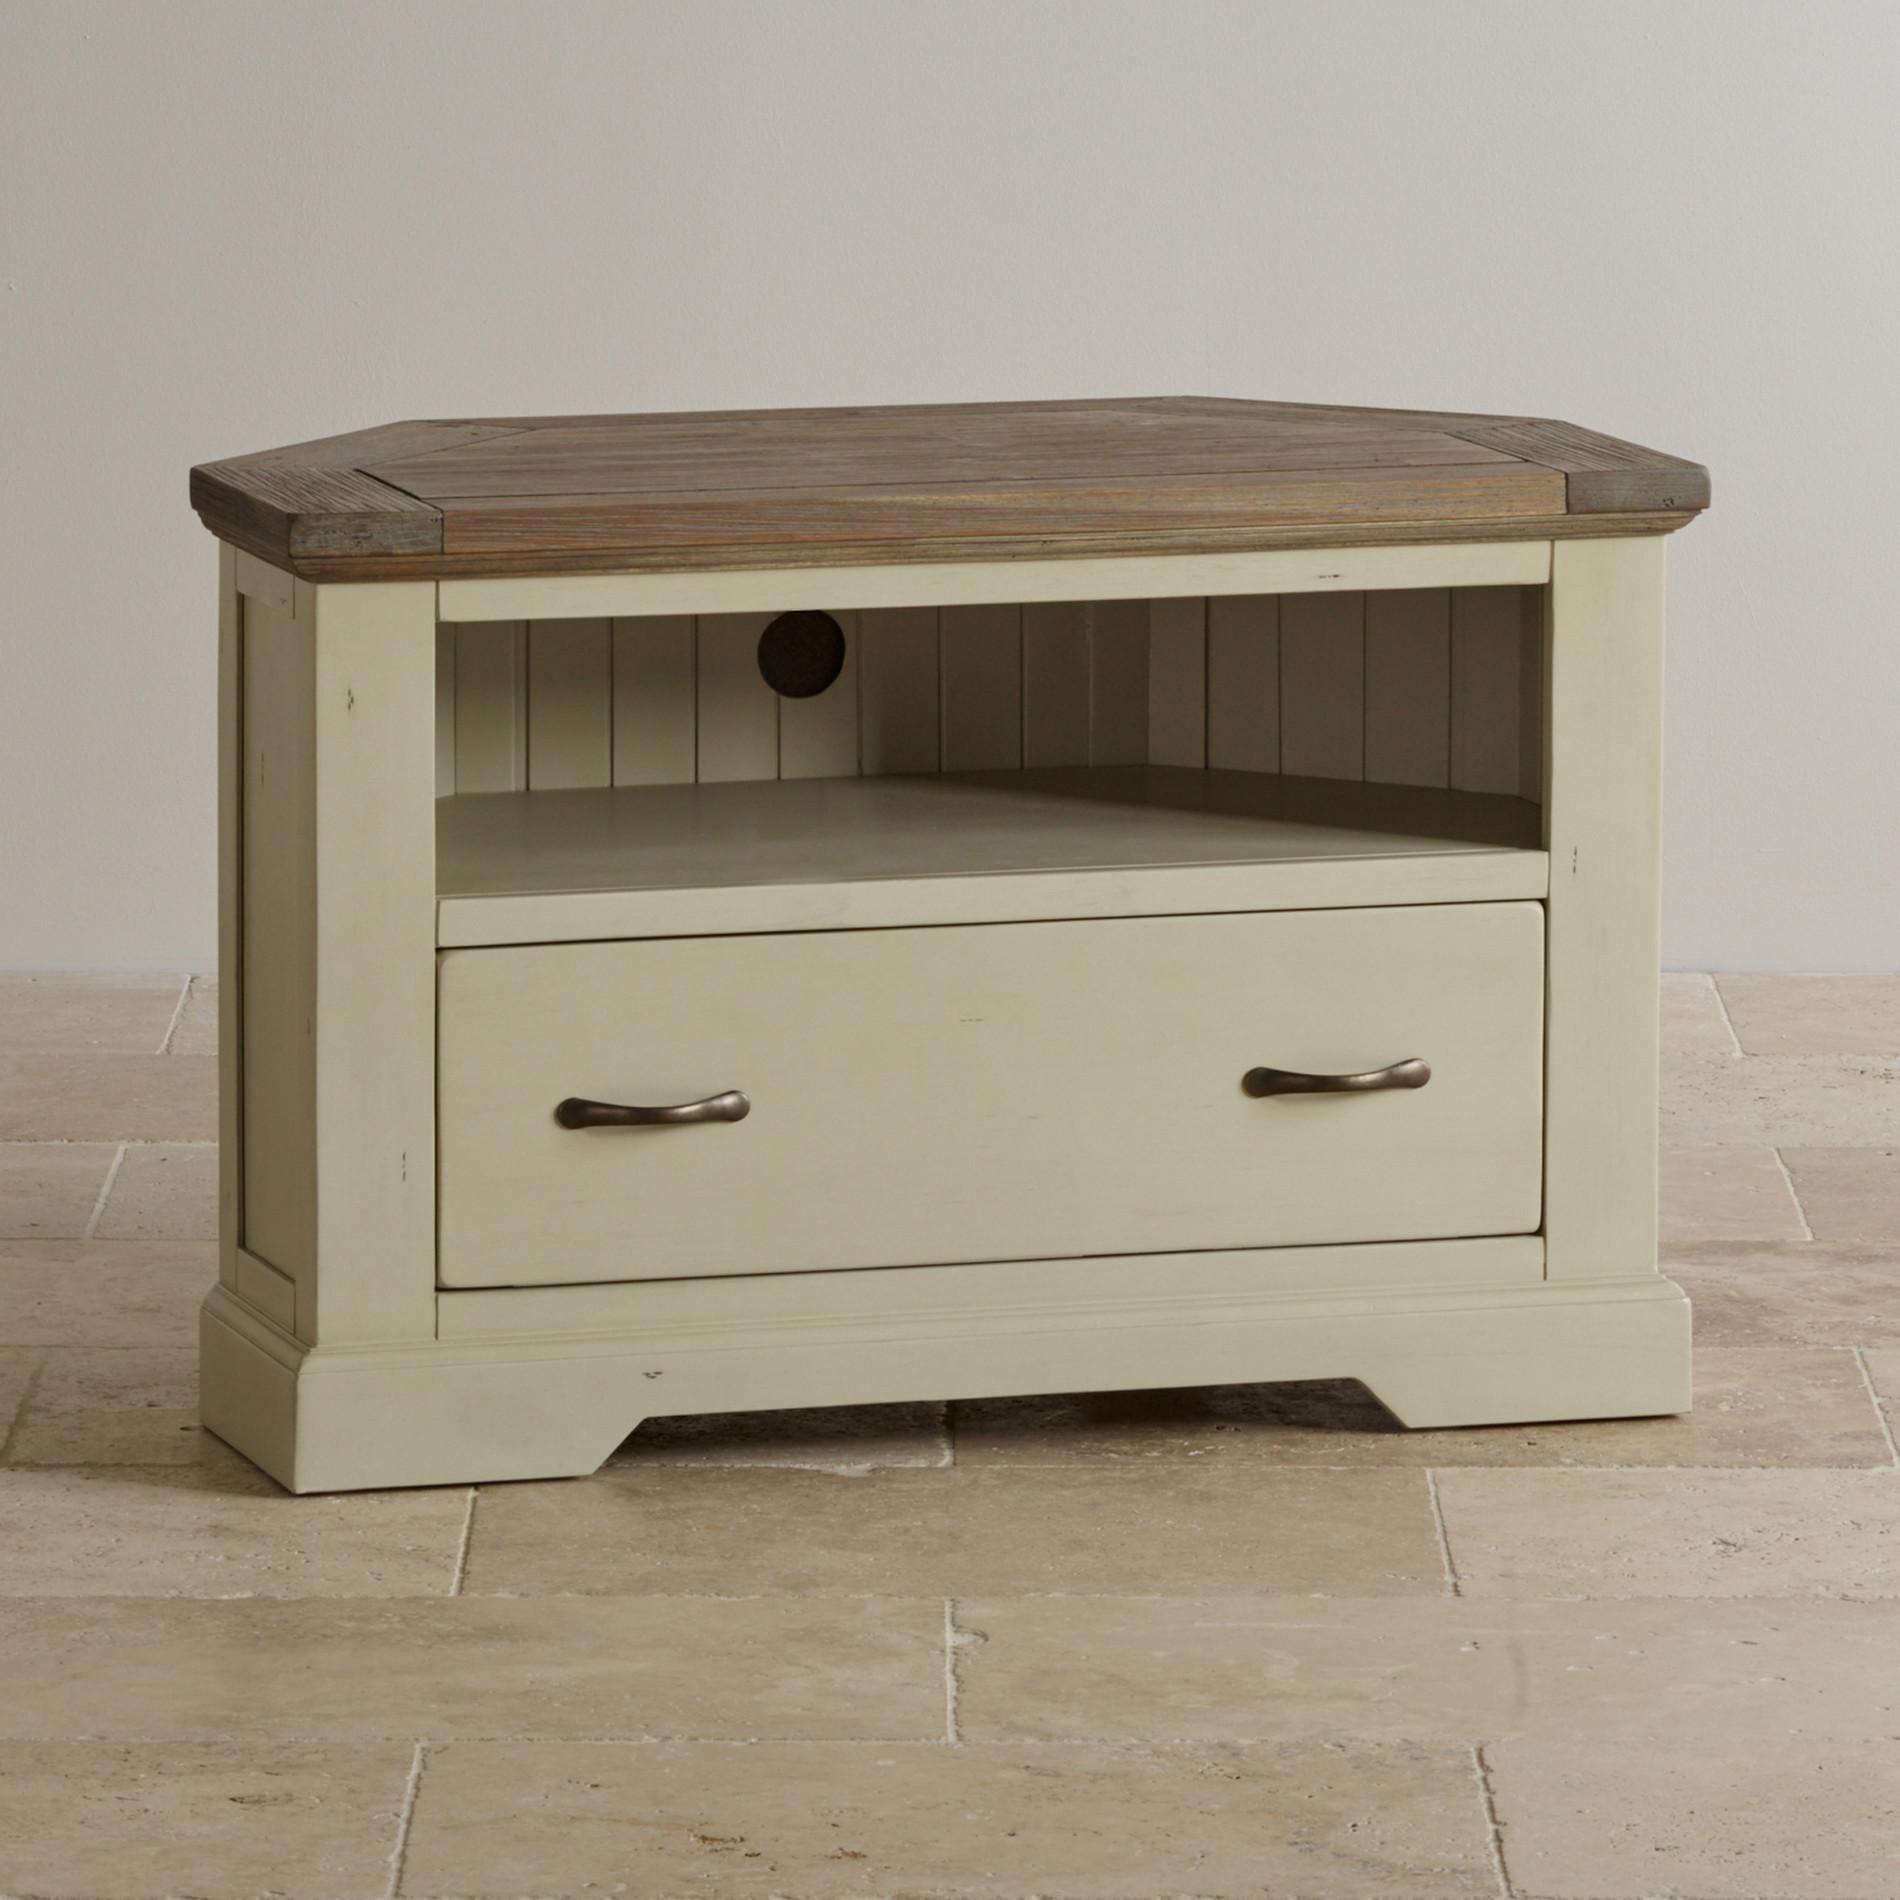 isabella painted acacia corner tv cabinet. Black Bedroom Furniture Sets. Home Design Ideas